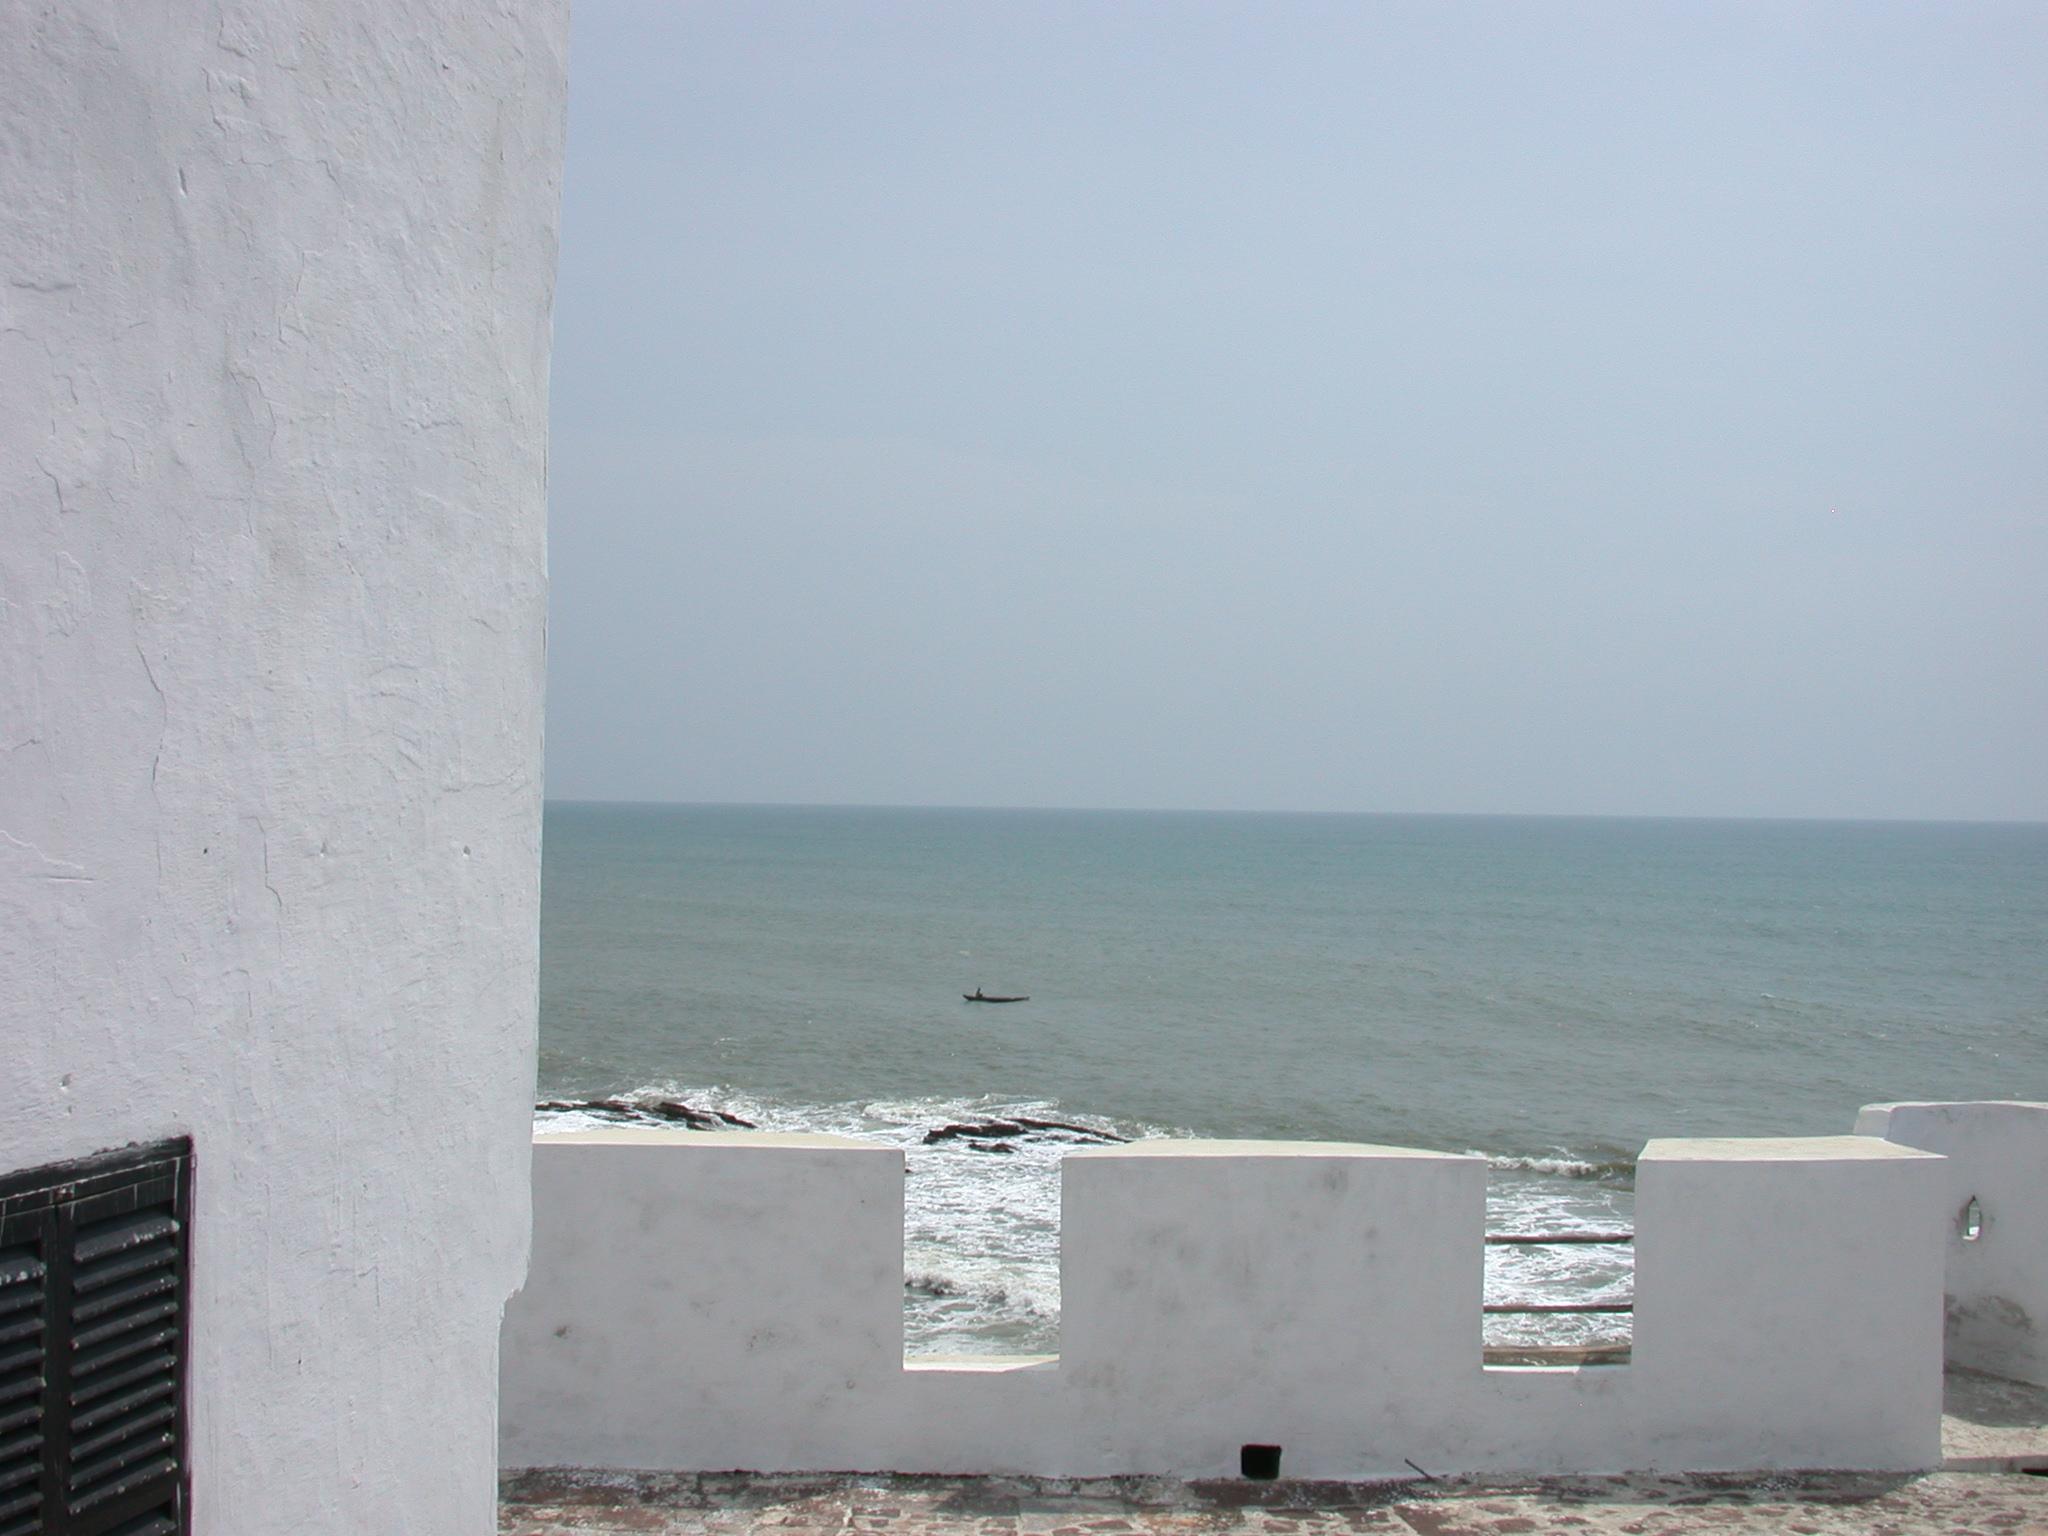 Sea View From Upper Level Roof Terrace, Elmina Slave Fort, Elmina, Ghana